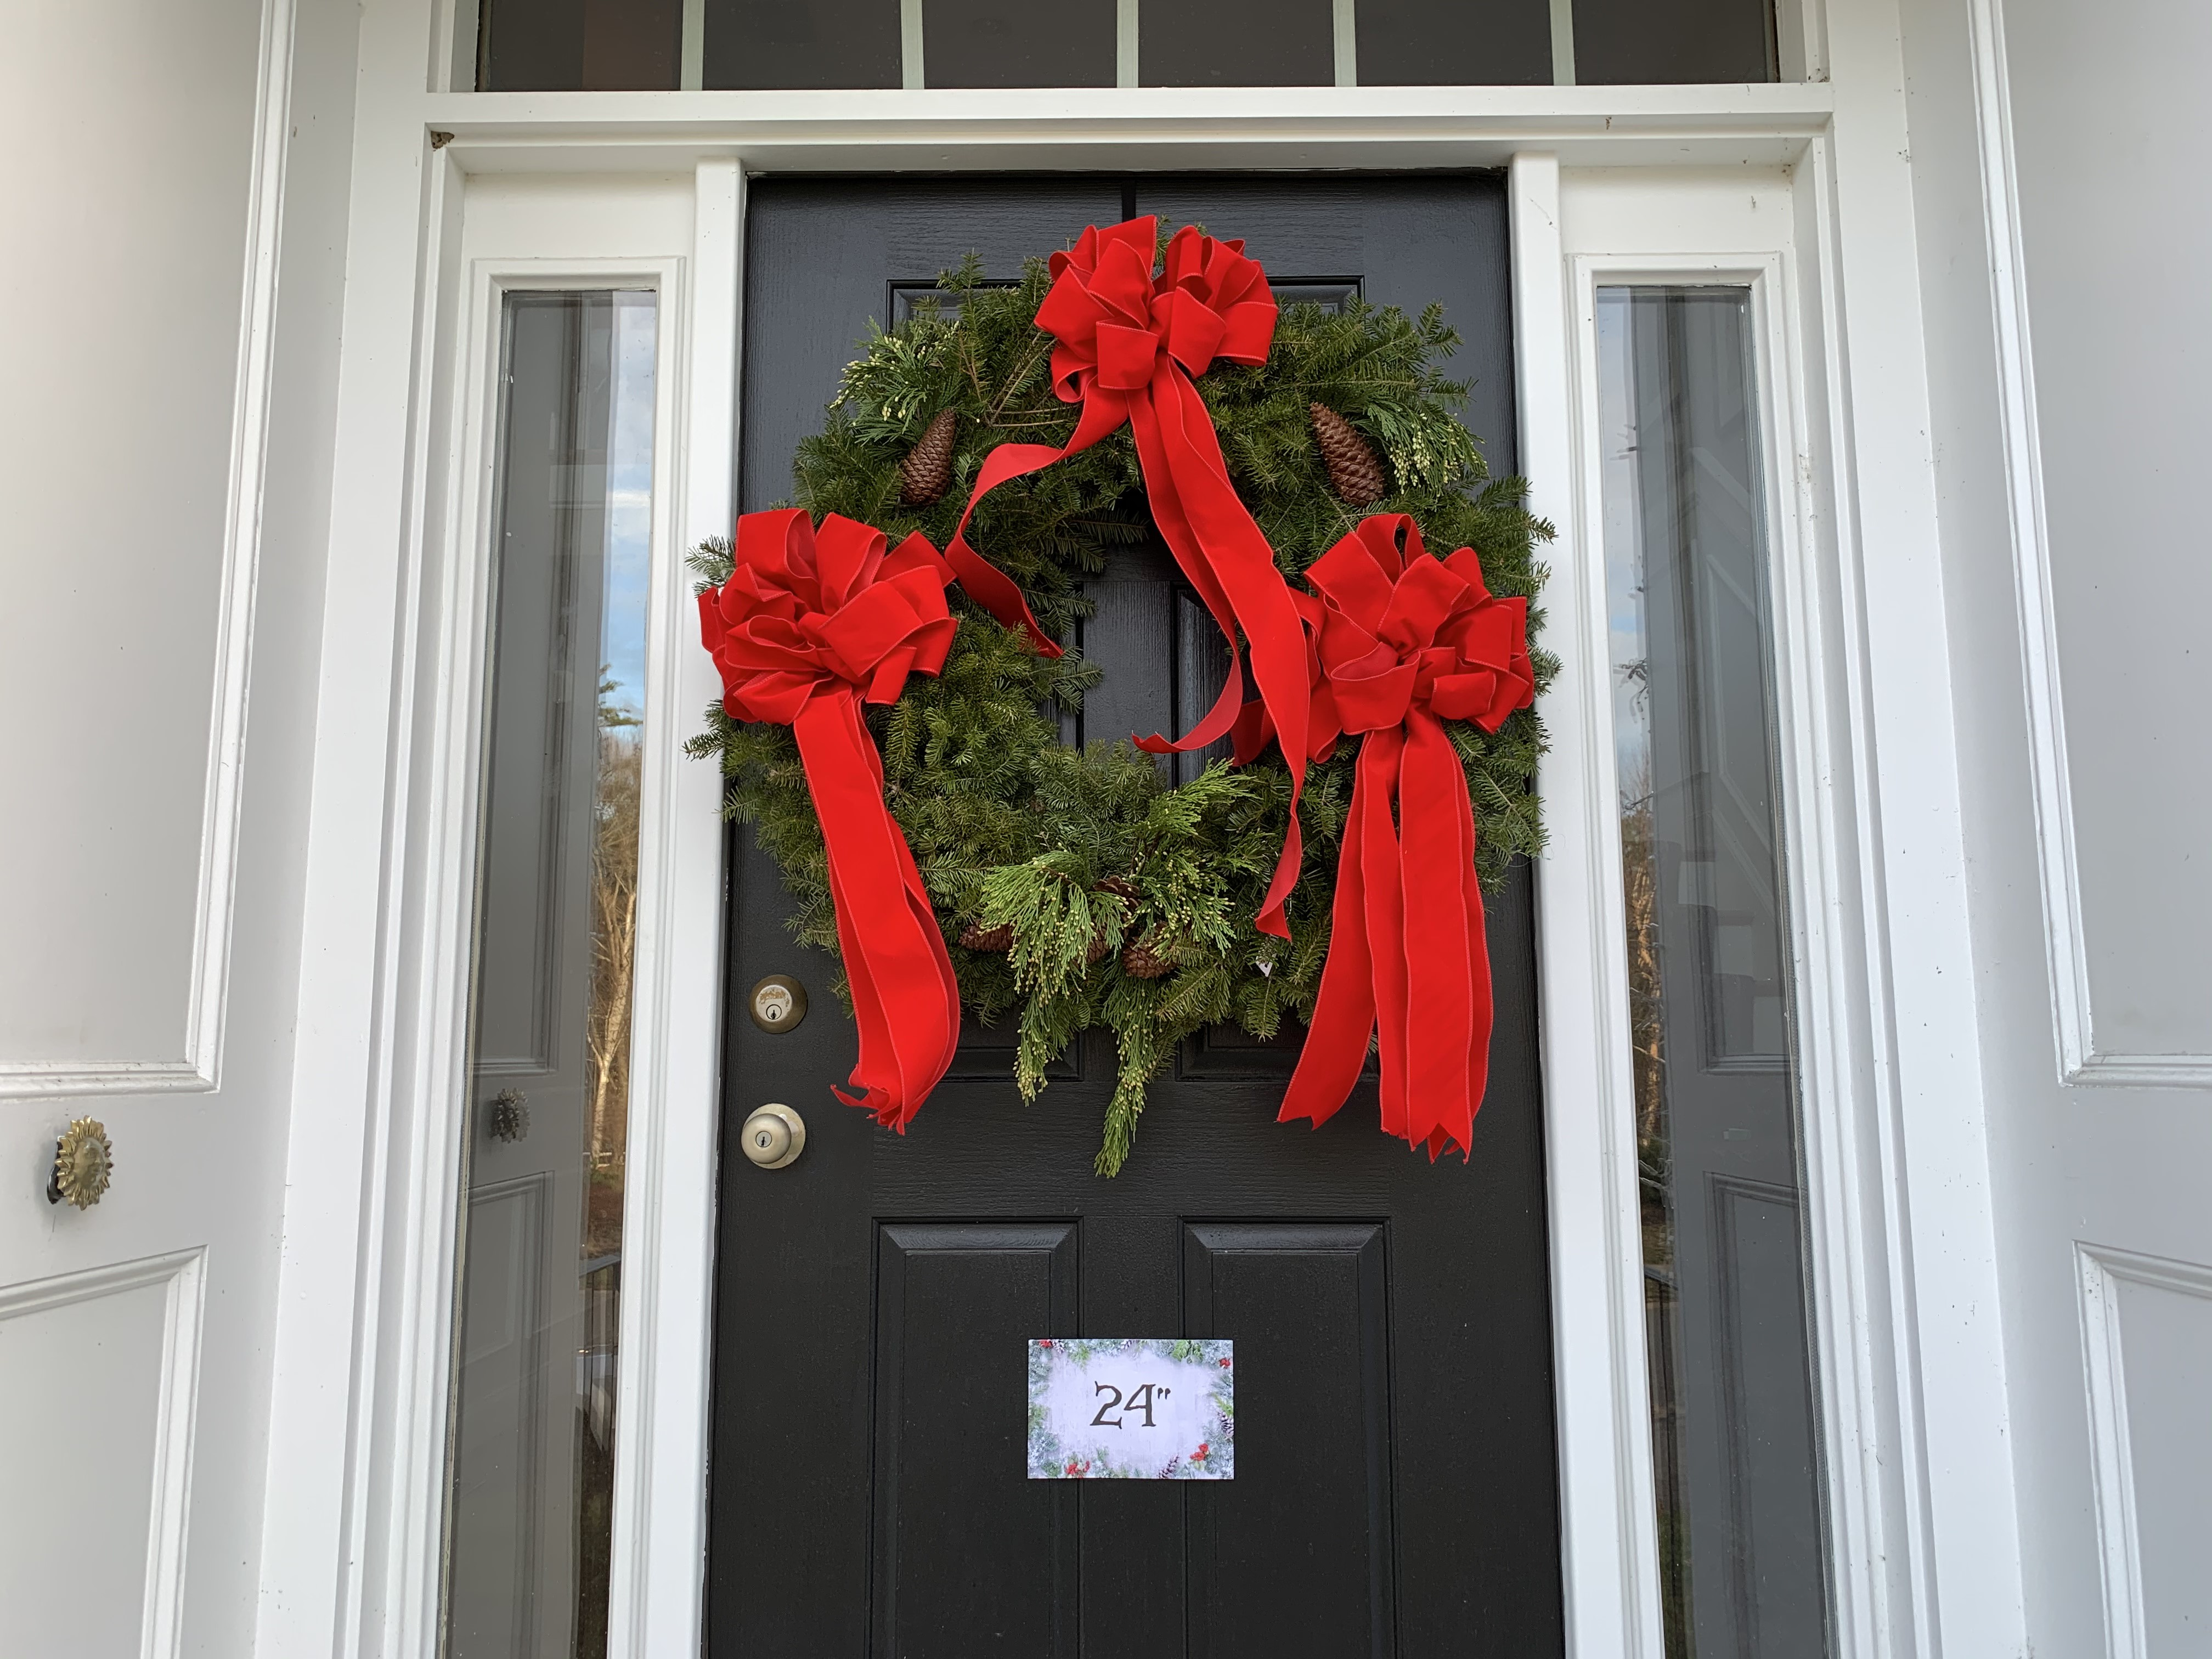 "24"" Wreath"